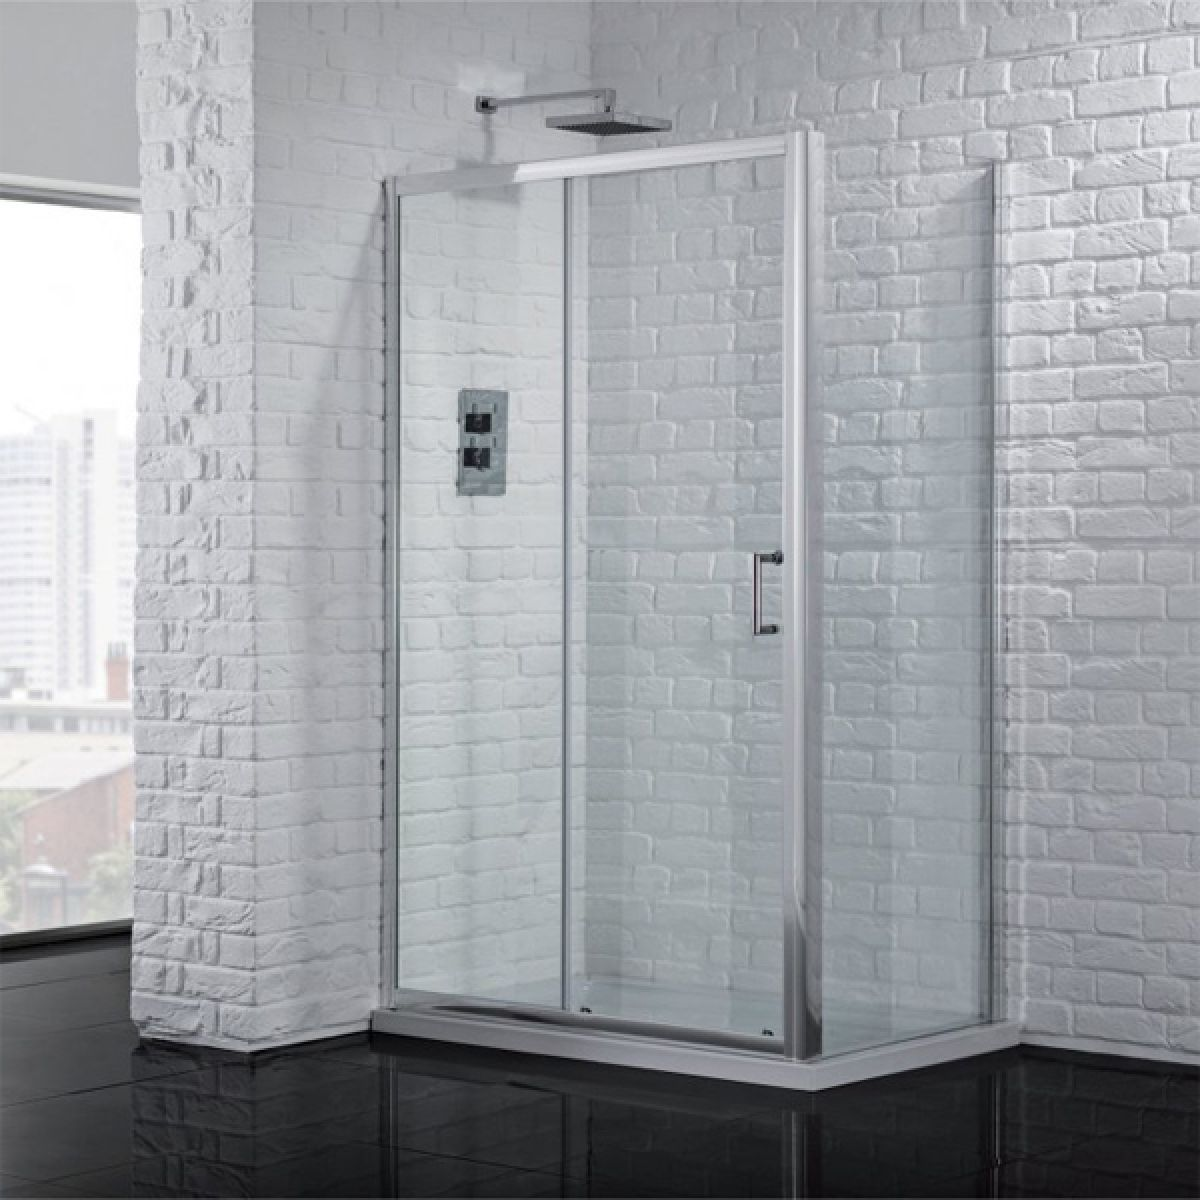 Aquadart Venturi 6 Sliding Shower Door with Optional Side Panel